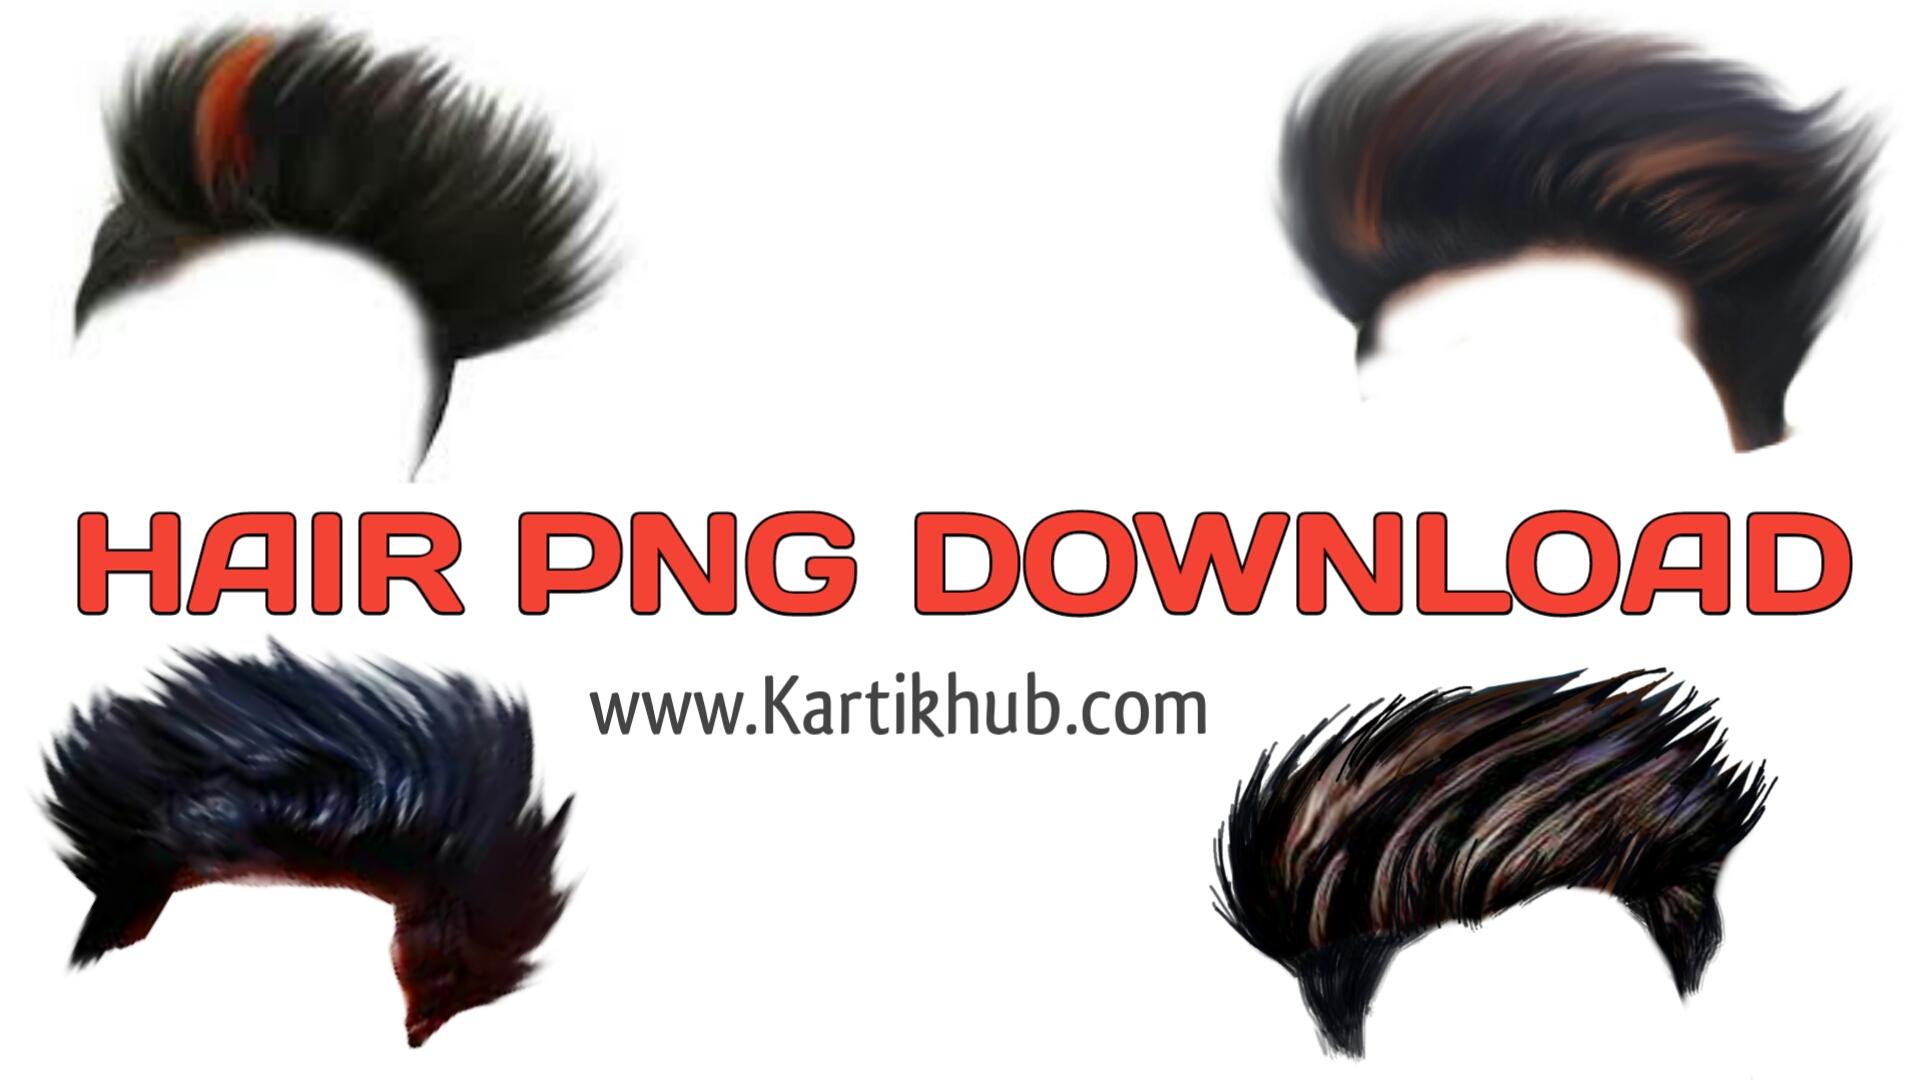 Cb edit hair png download 2019, hair png hd for picsart.